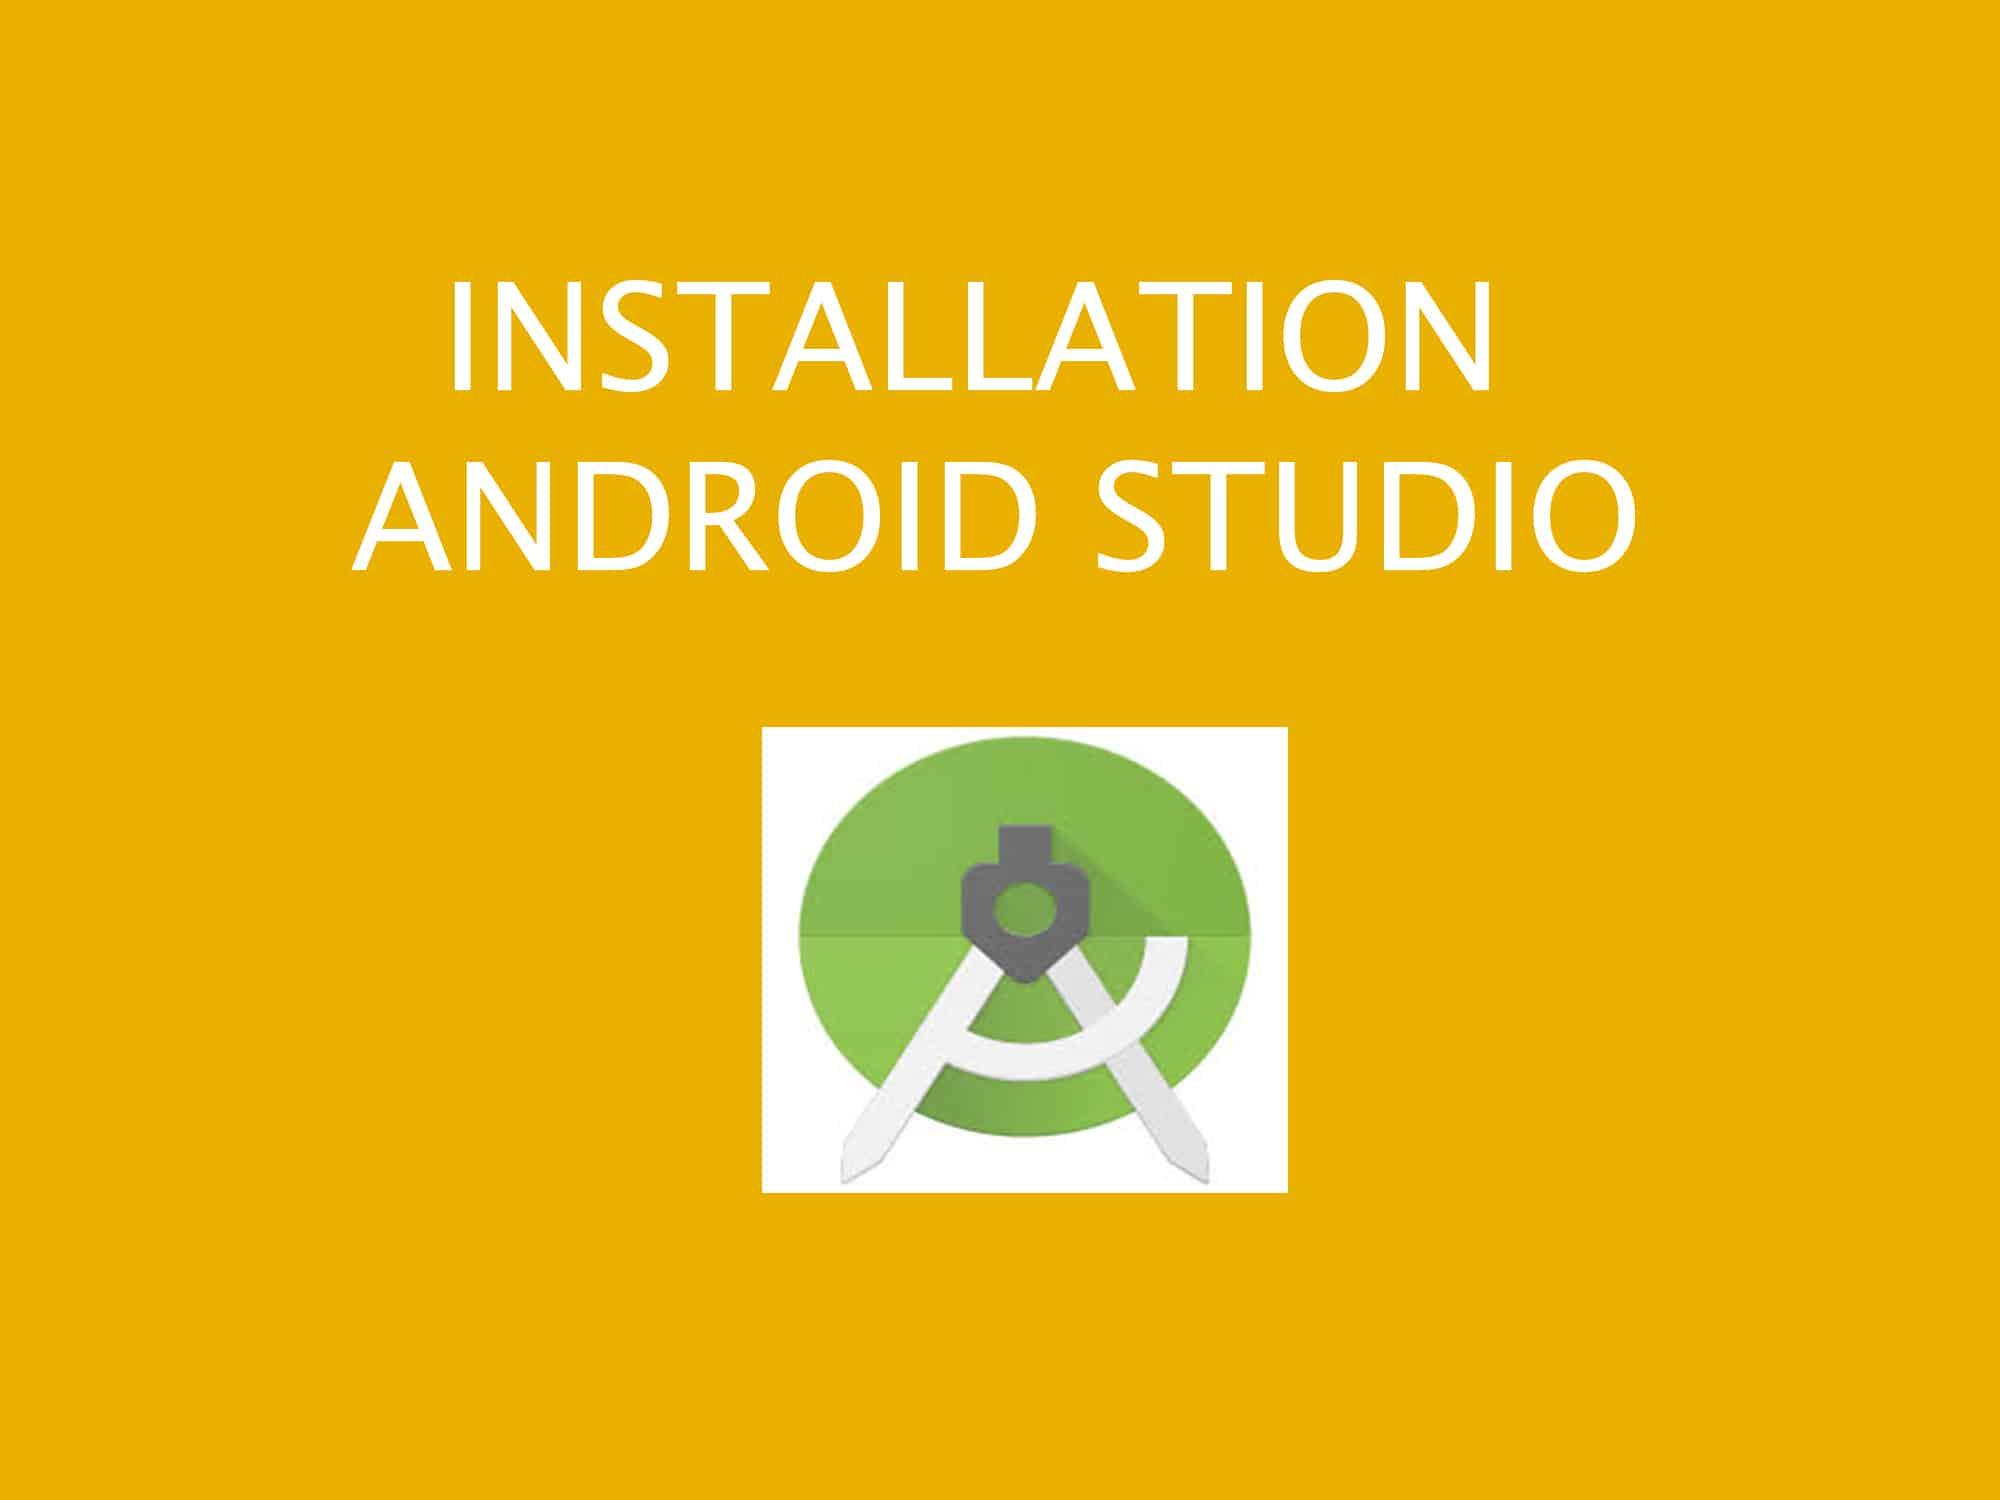 Installation Android Studio